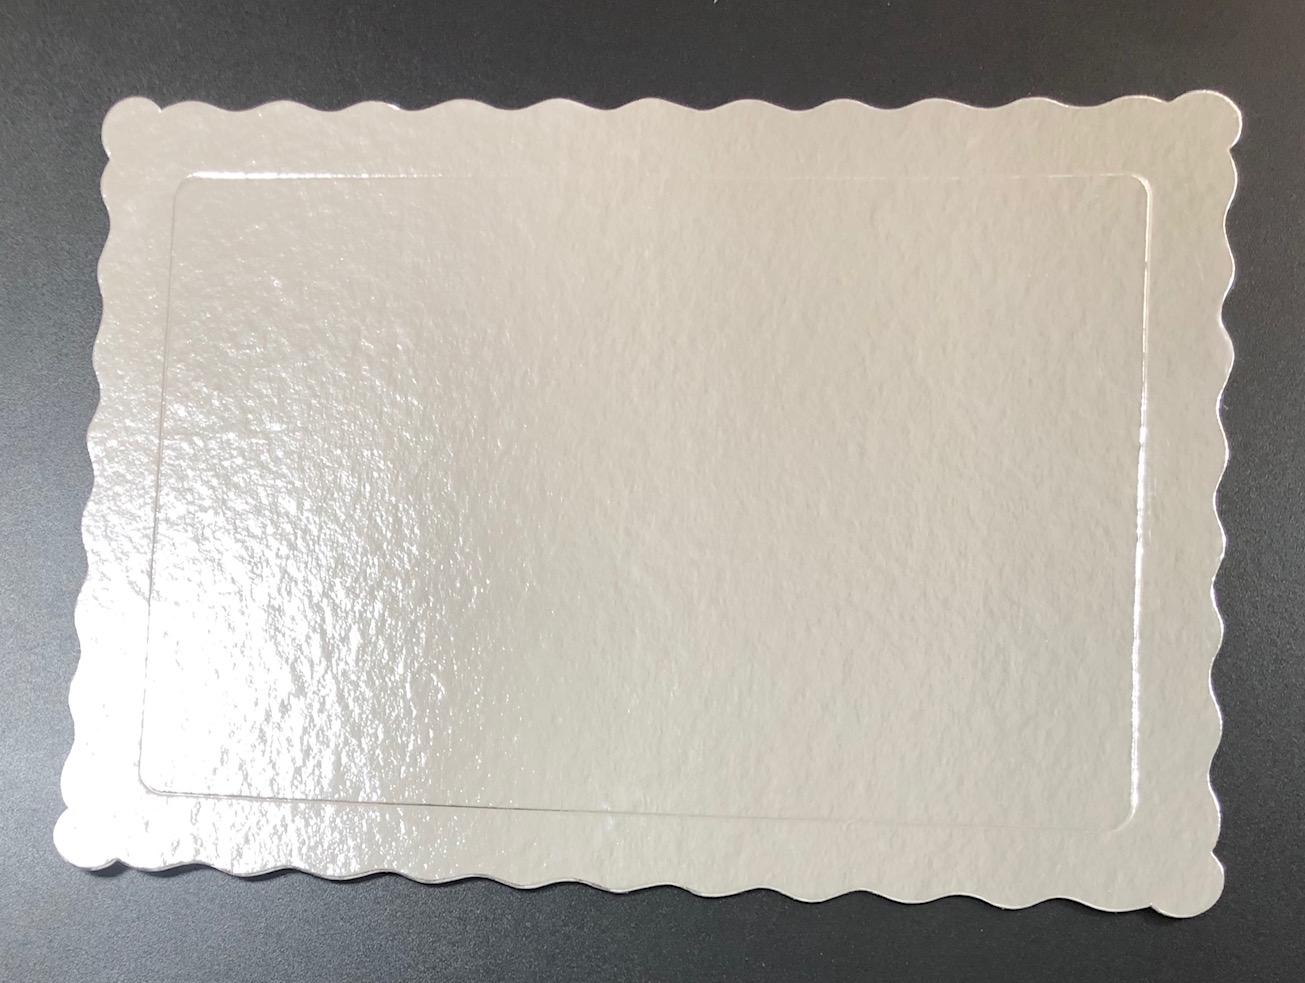 100 Bases Laminadas Para Bolo Retangular, Cake Board 35x25cm - Prata